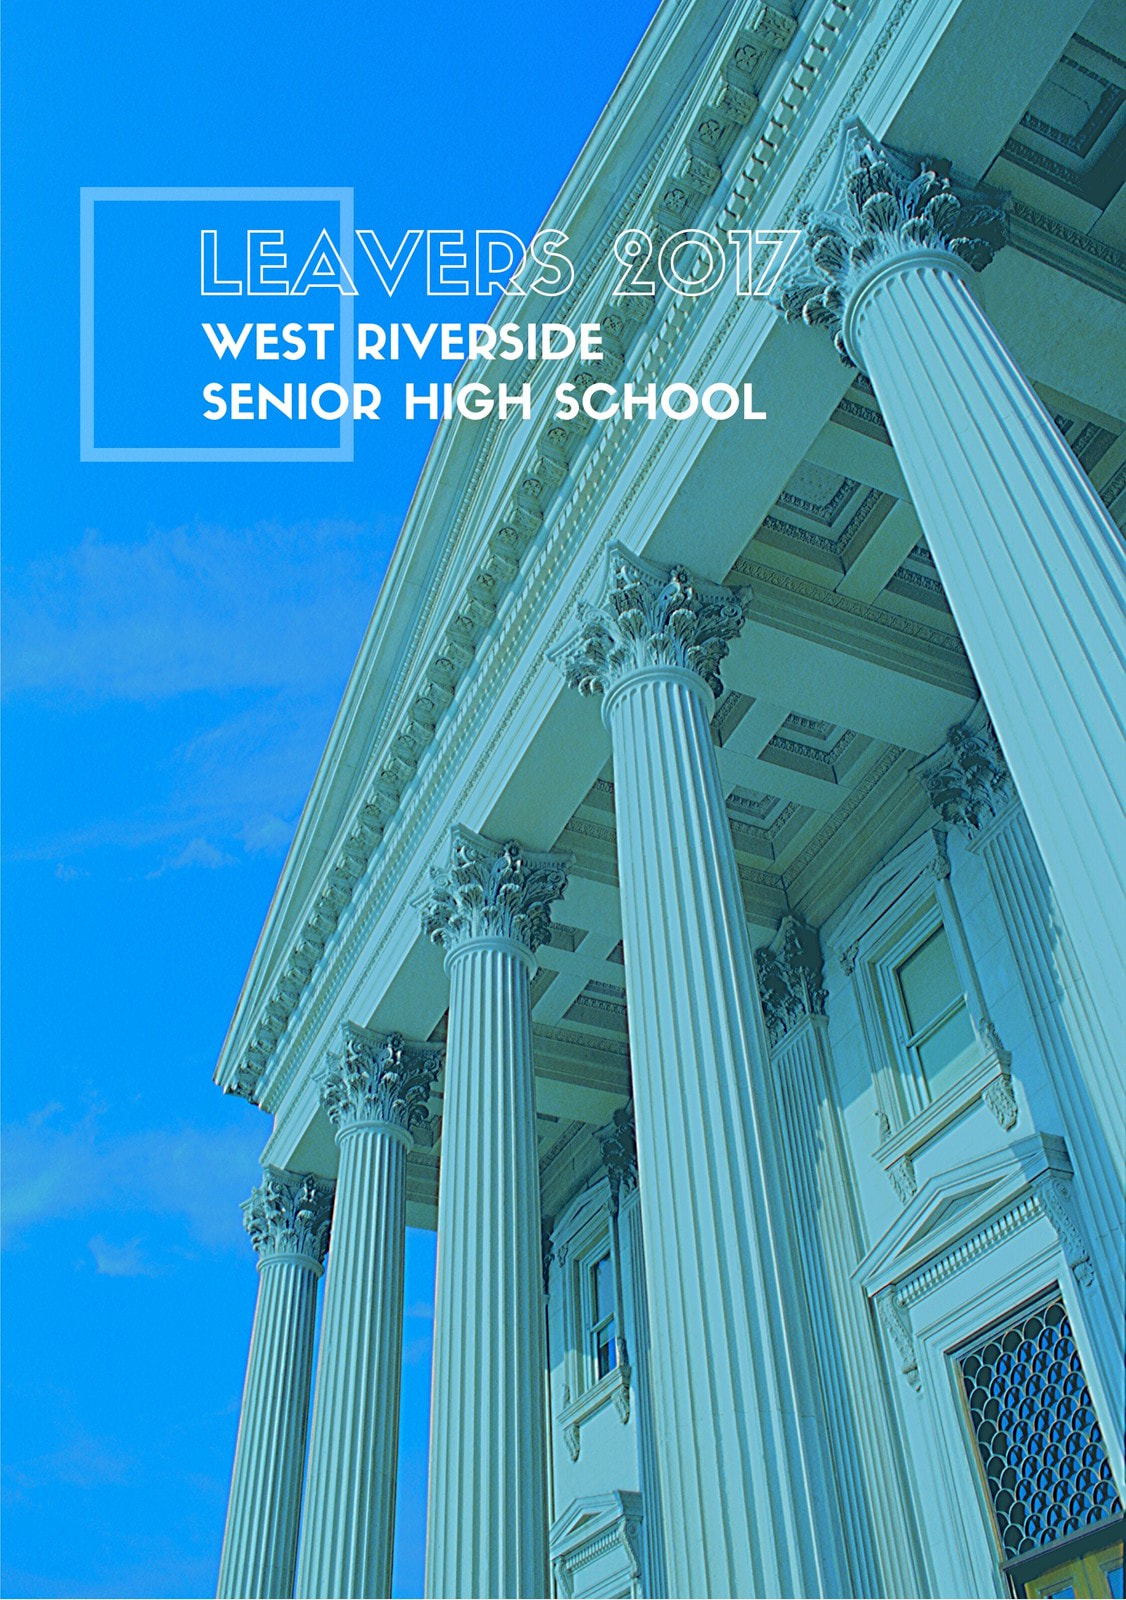 Blue University Photo Crisp Cut Yearbook